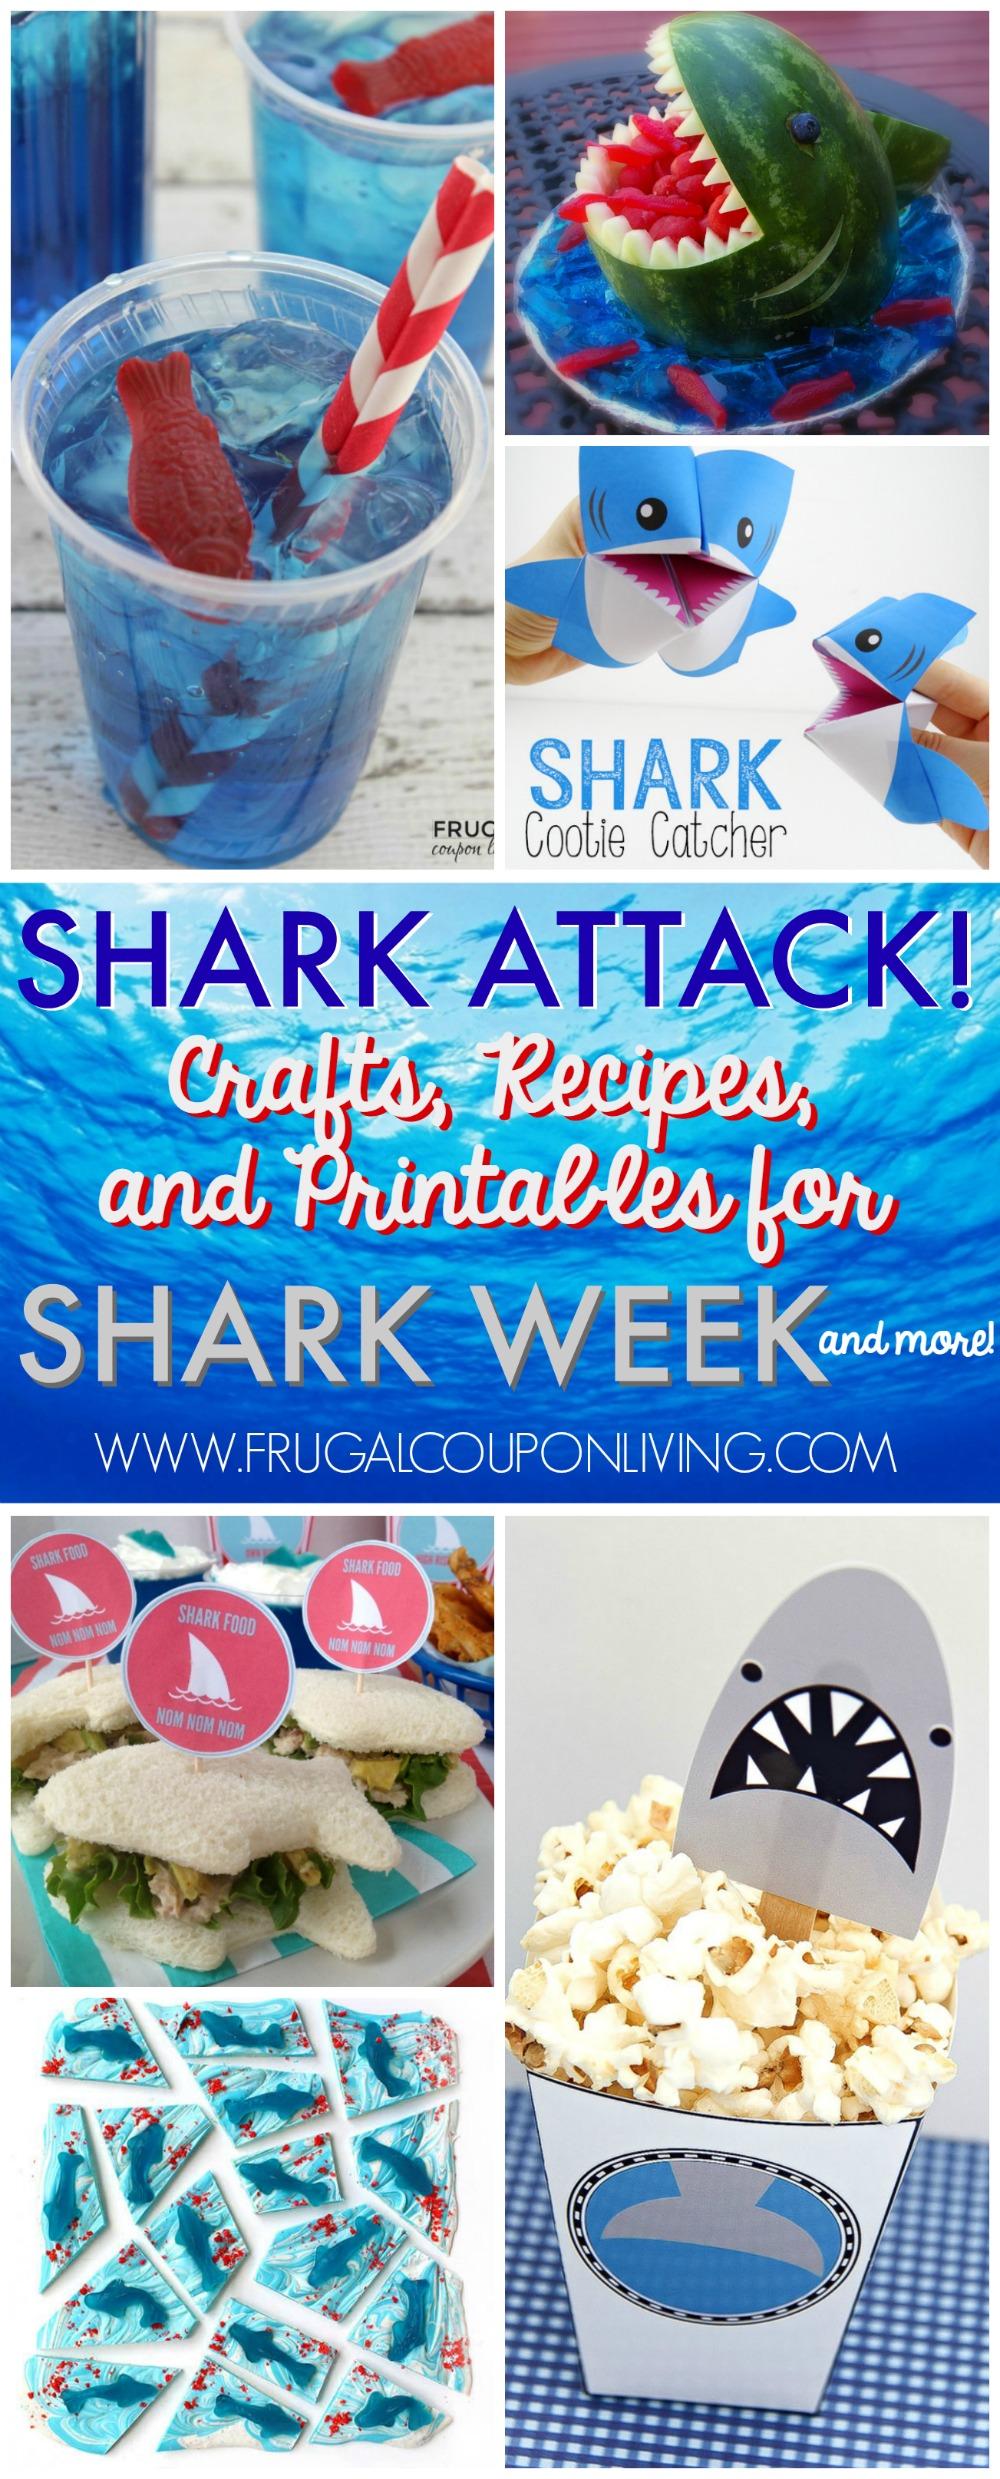 shark-week-collage-frugal-coupon-living